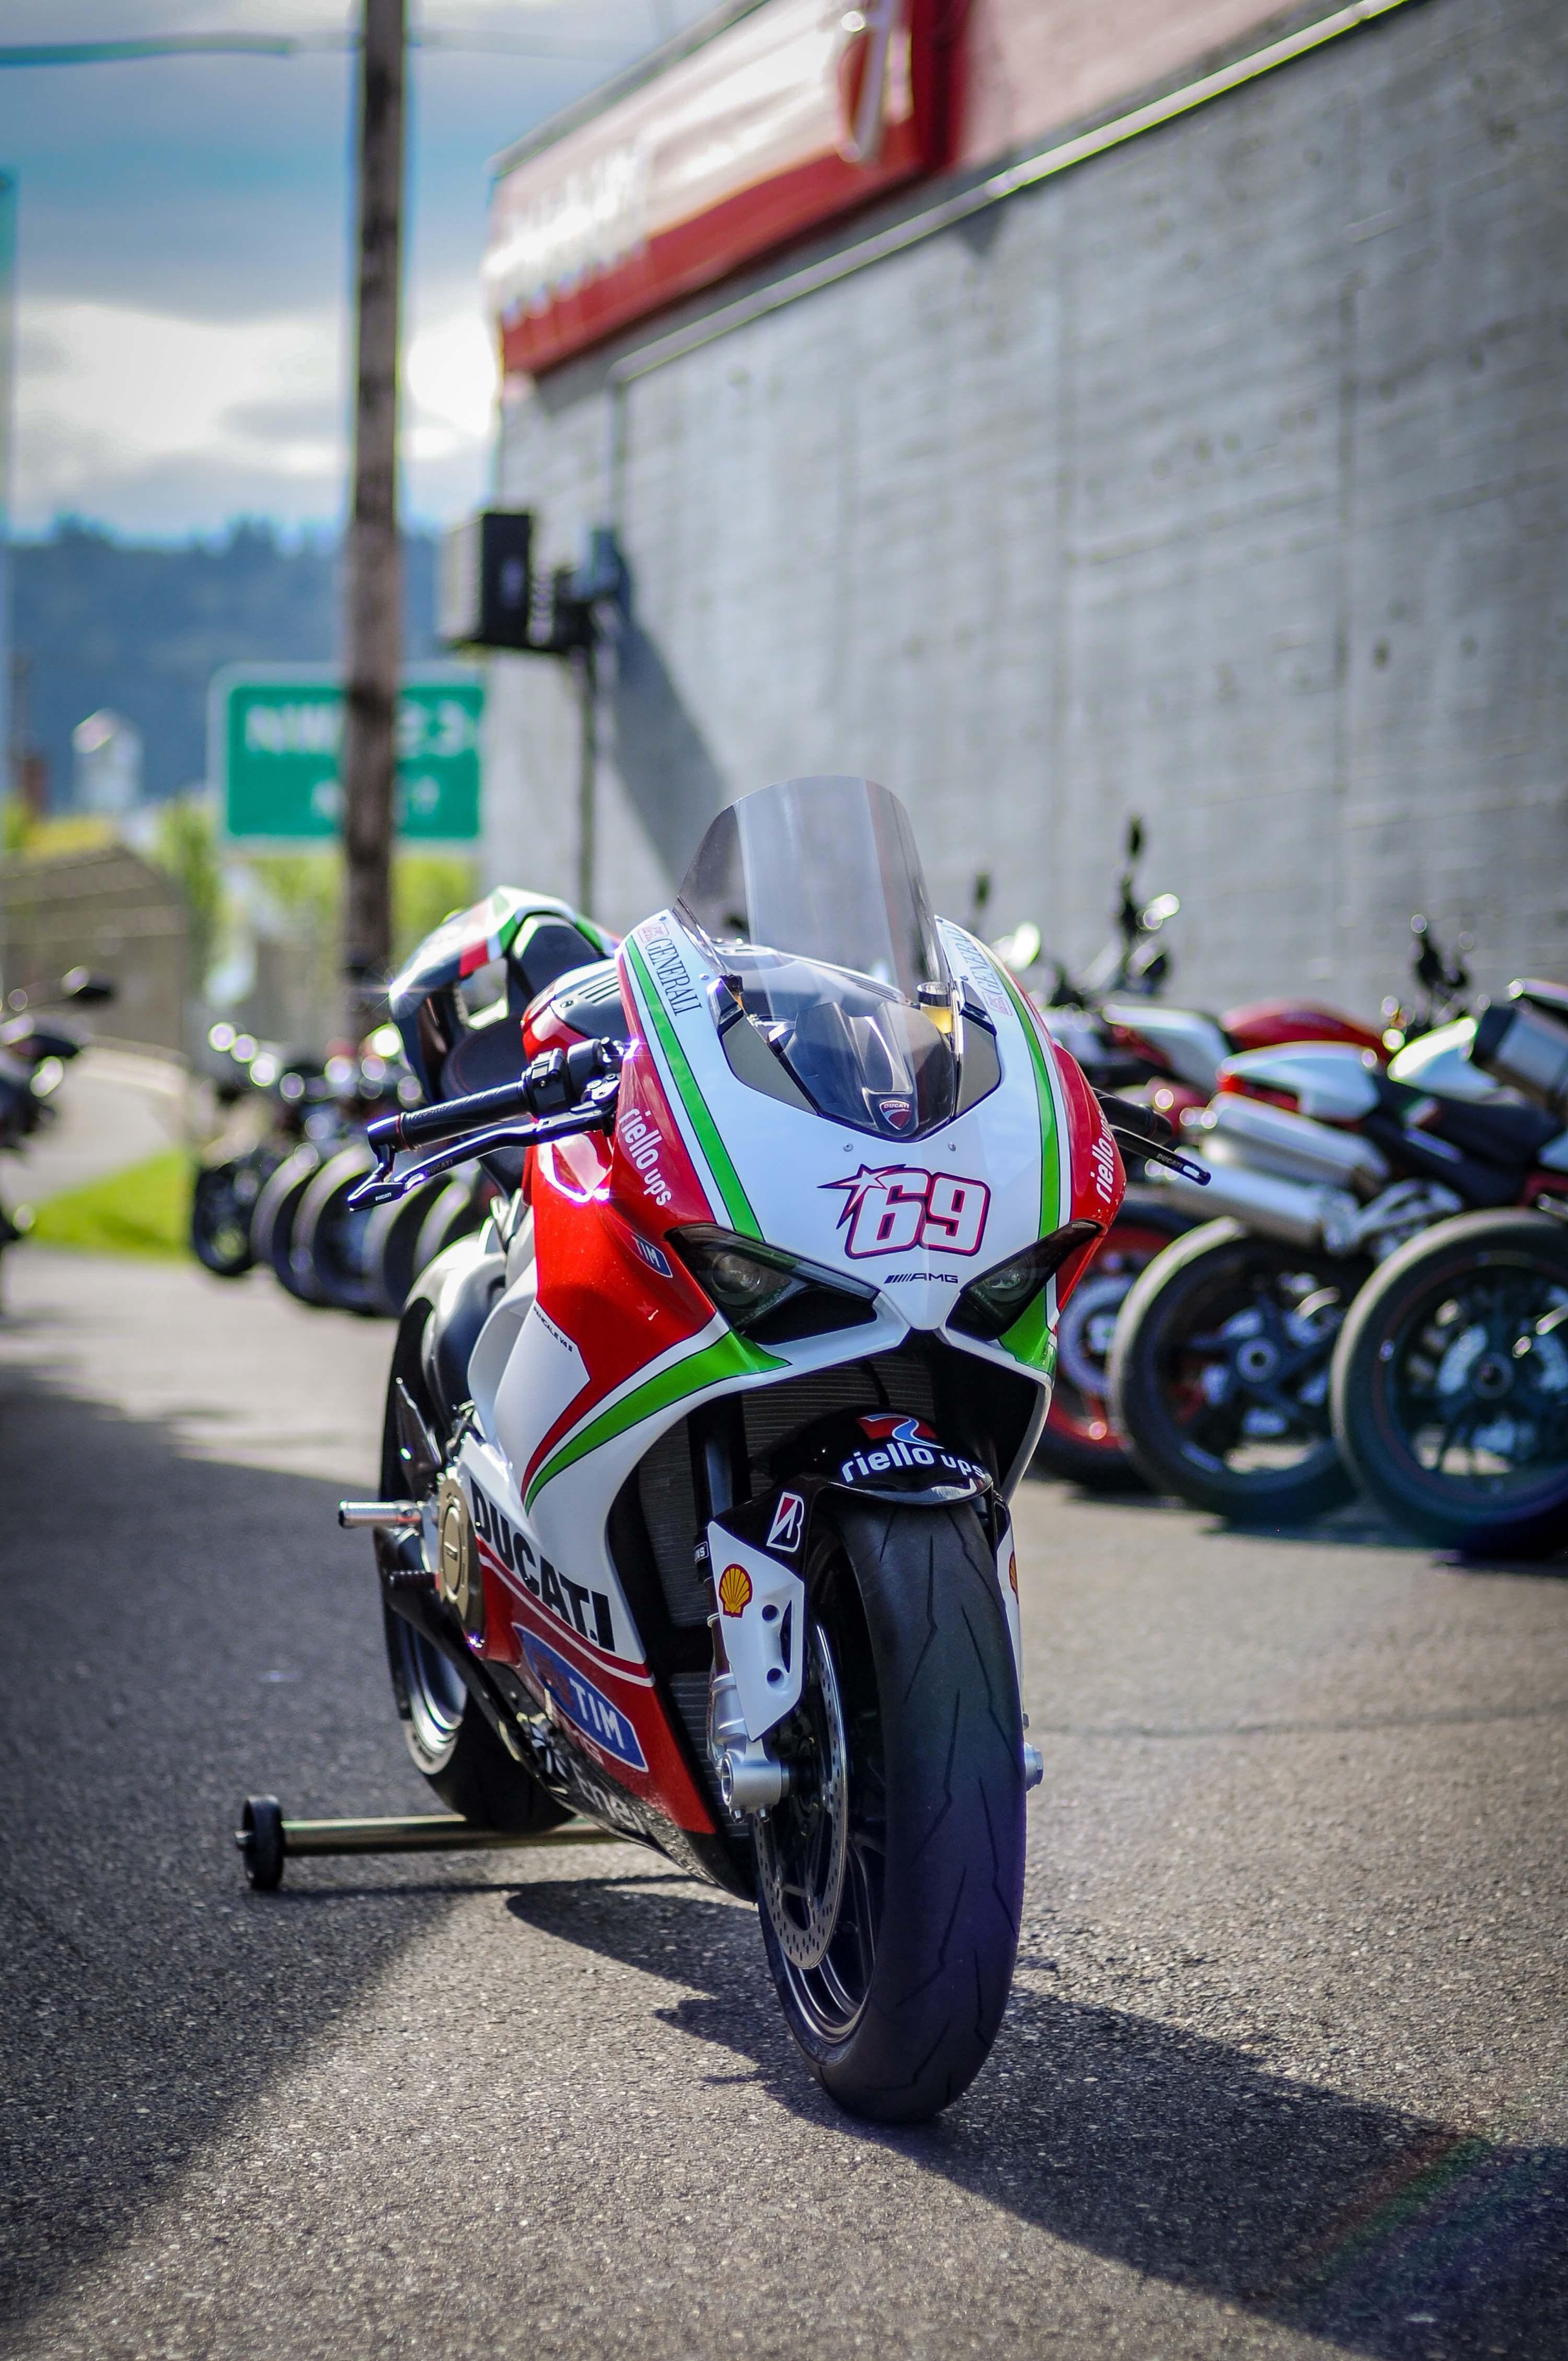 Nicky-Hayden-Ducati-Panigale-V4-tribute-36